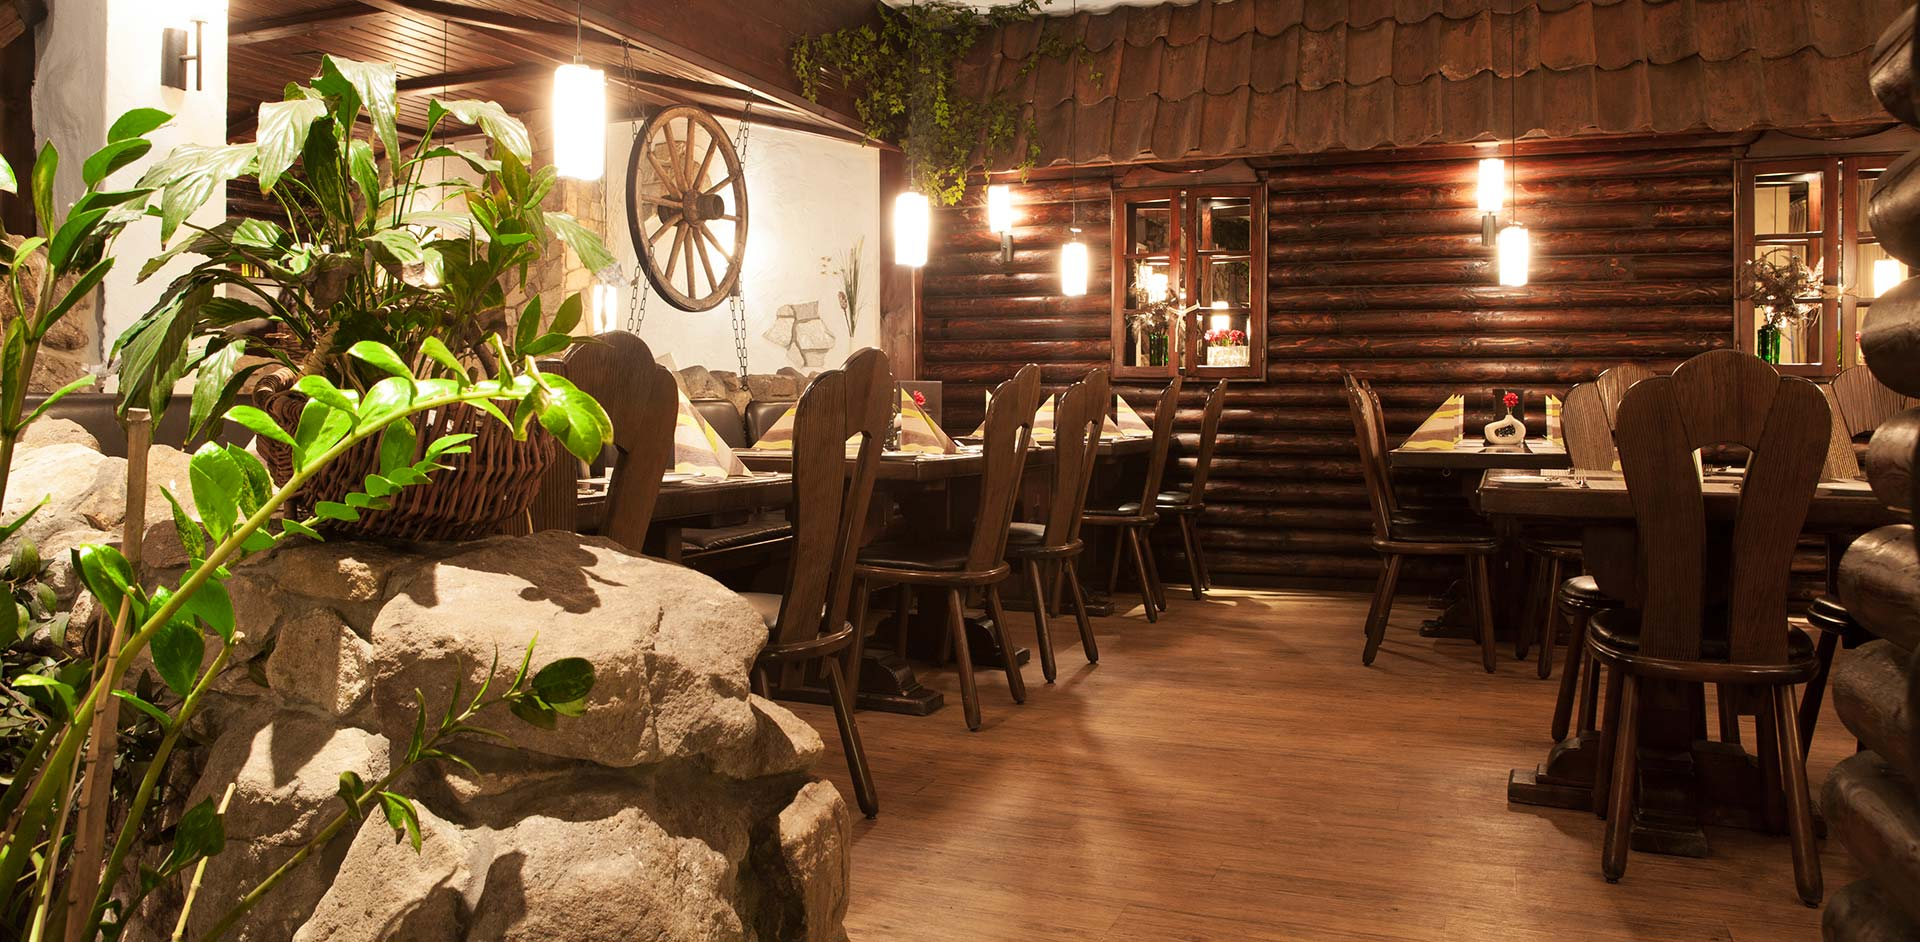 Steakhouse Gütersloh